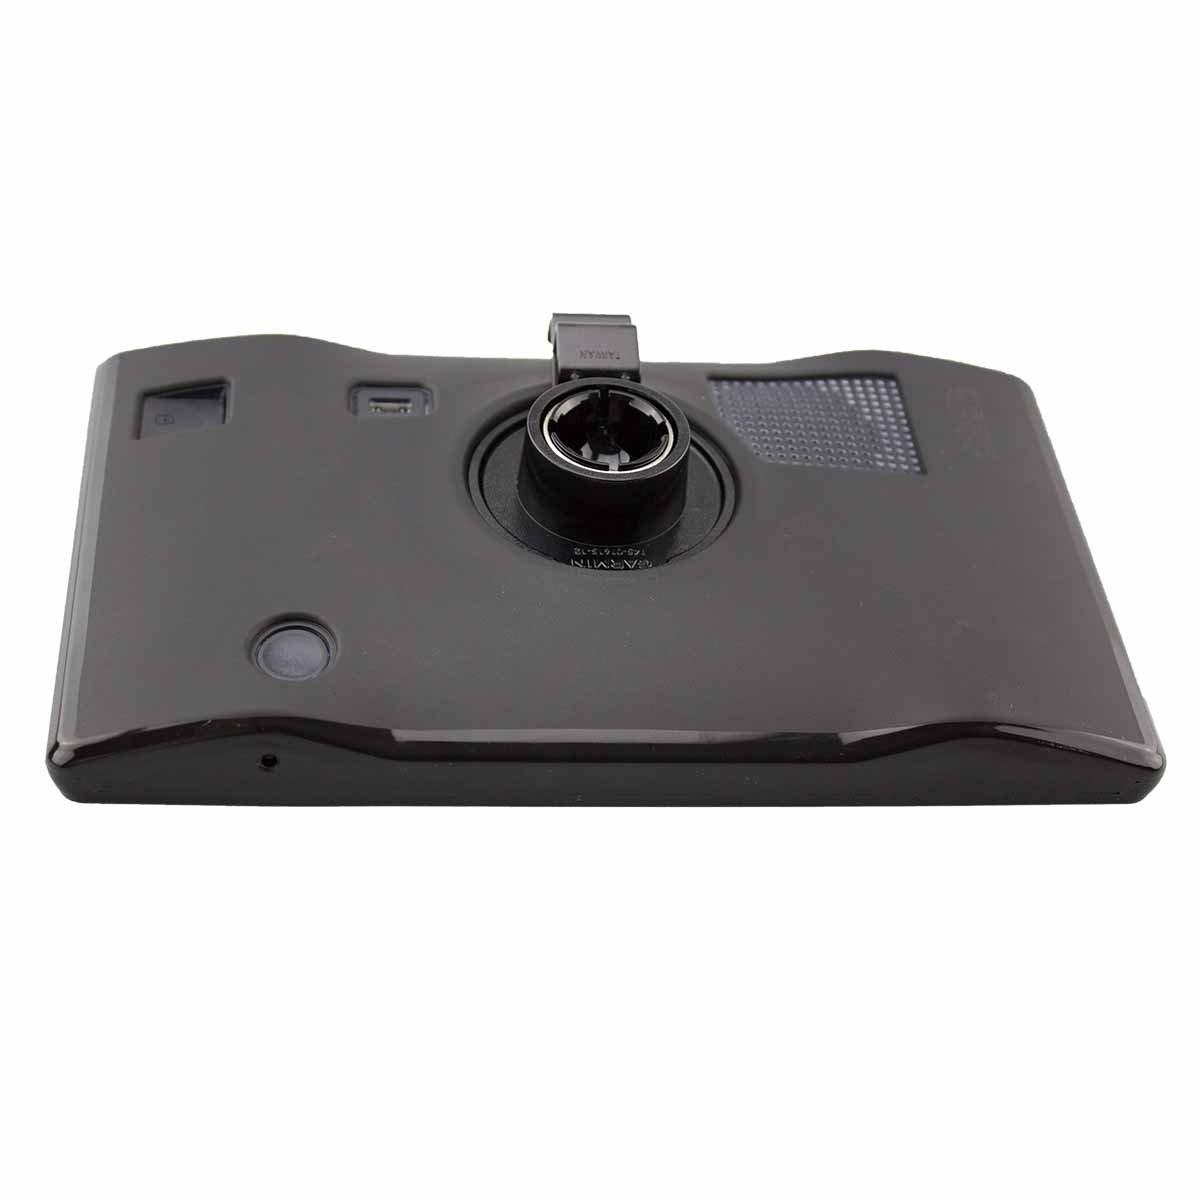 caseroxx GPS-Case per la Garmin Camper 770 LMT-D tasca per i dispositivi di navigazione in nero.